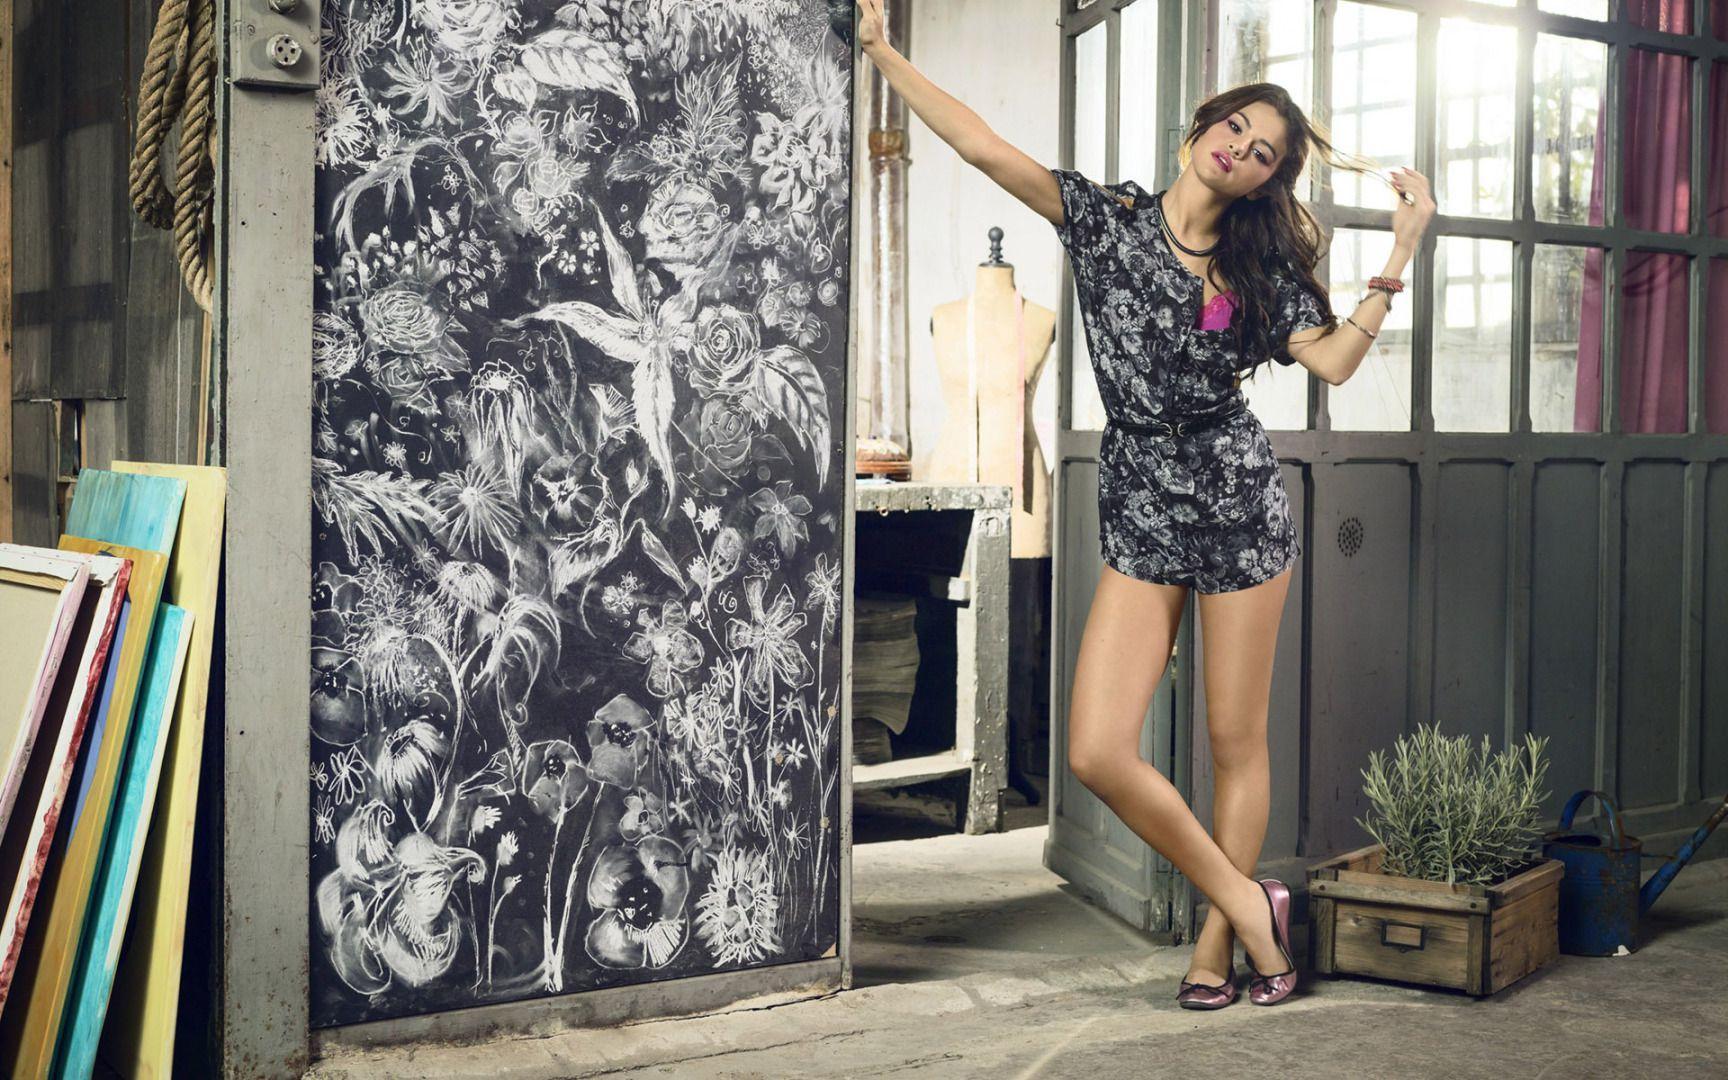 Download Selena Gomez Hot Hd Wallpapers Hd Backgrounds